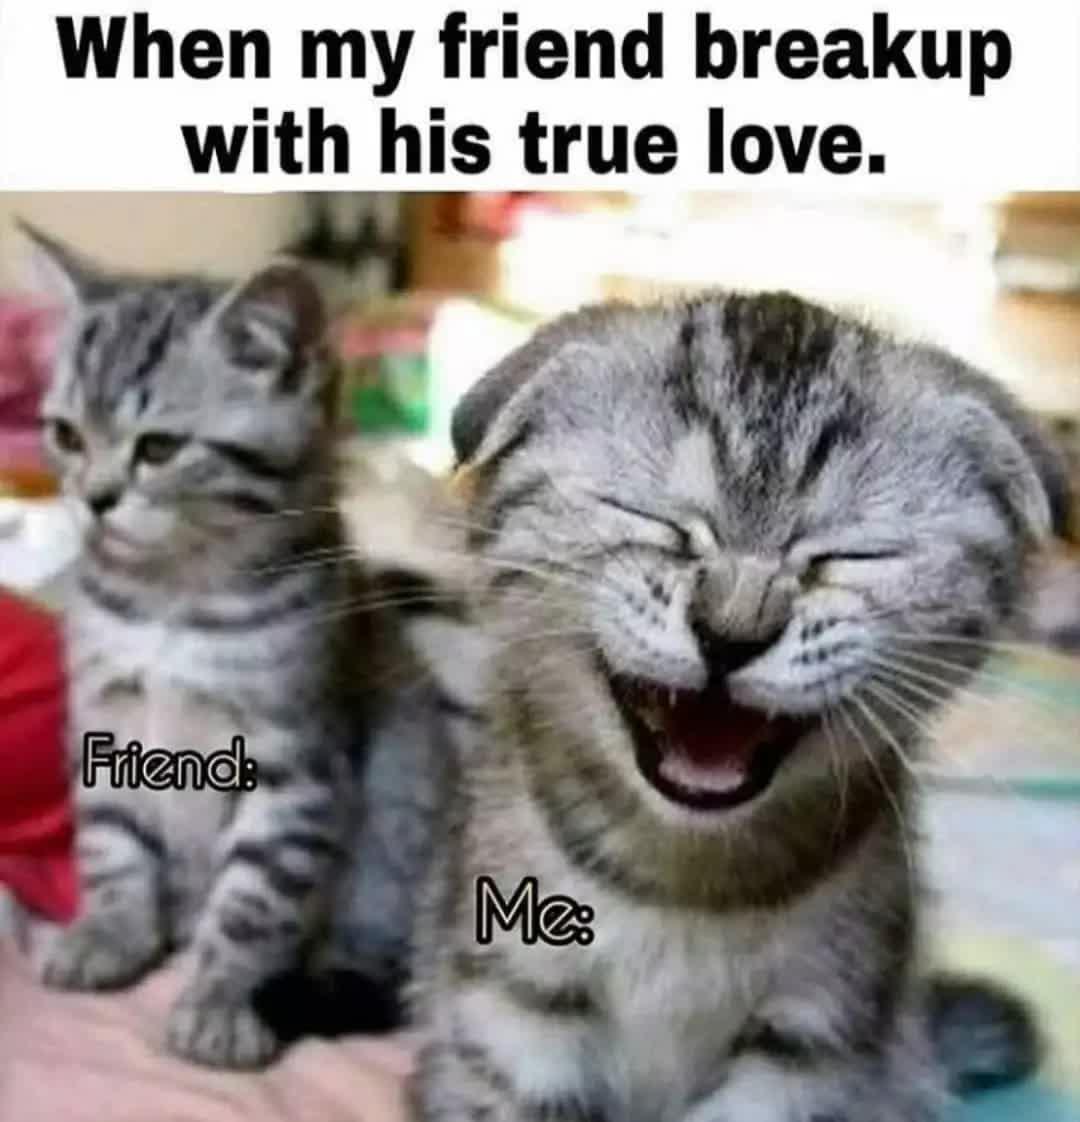 When my friend breakup with his true love. Friends Me